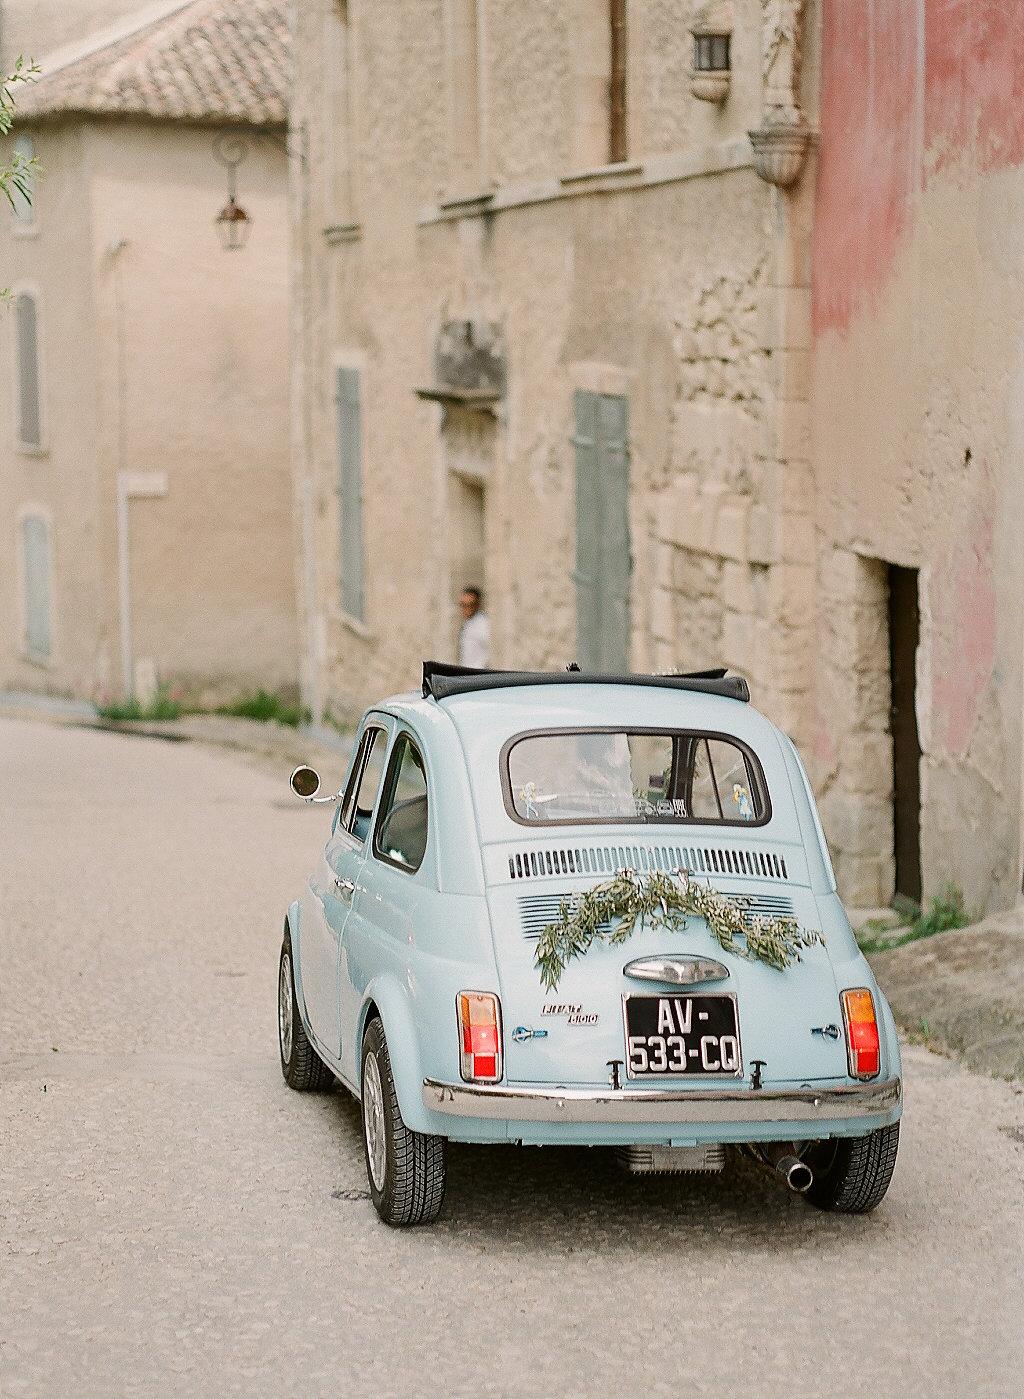 le coeur dans les etoiles - wedding planner - provence - luberon - alpilles - drome - vaucluse - sardaigne - italie - organisation - mariage - shooting - dolce vita - valery villard-195